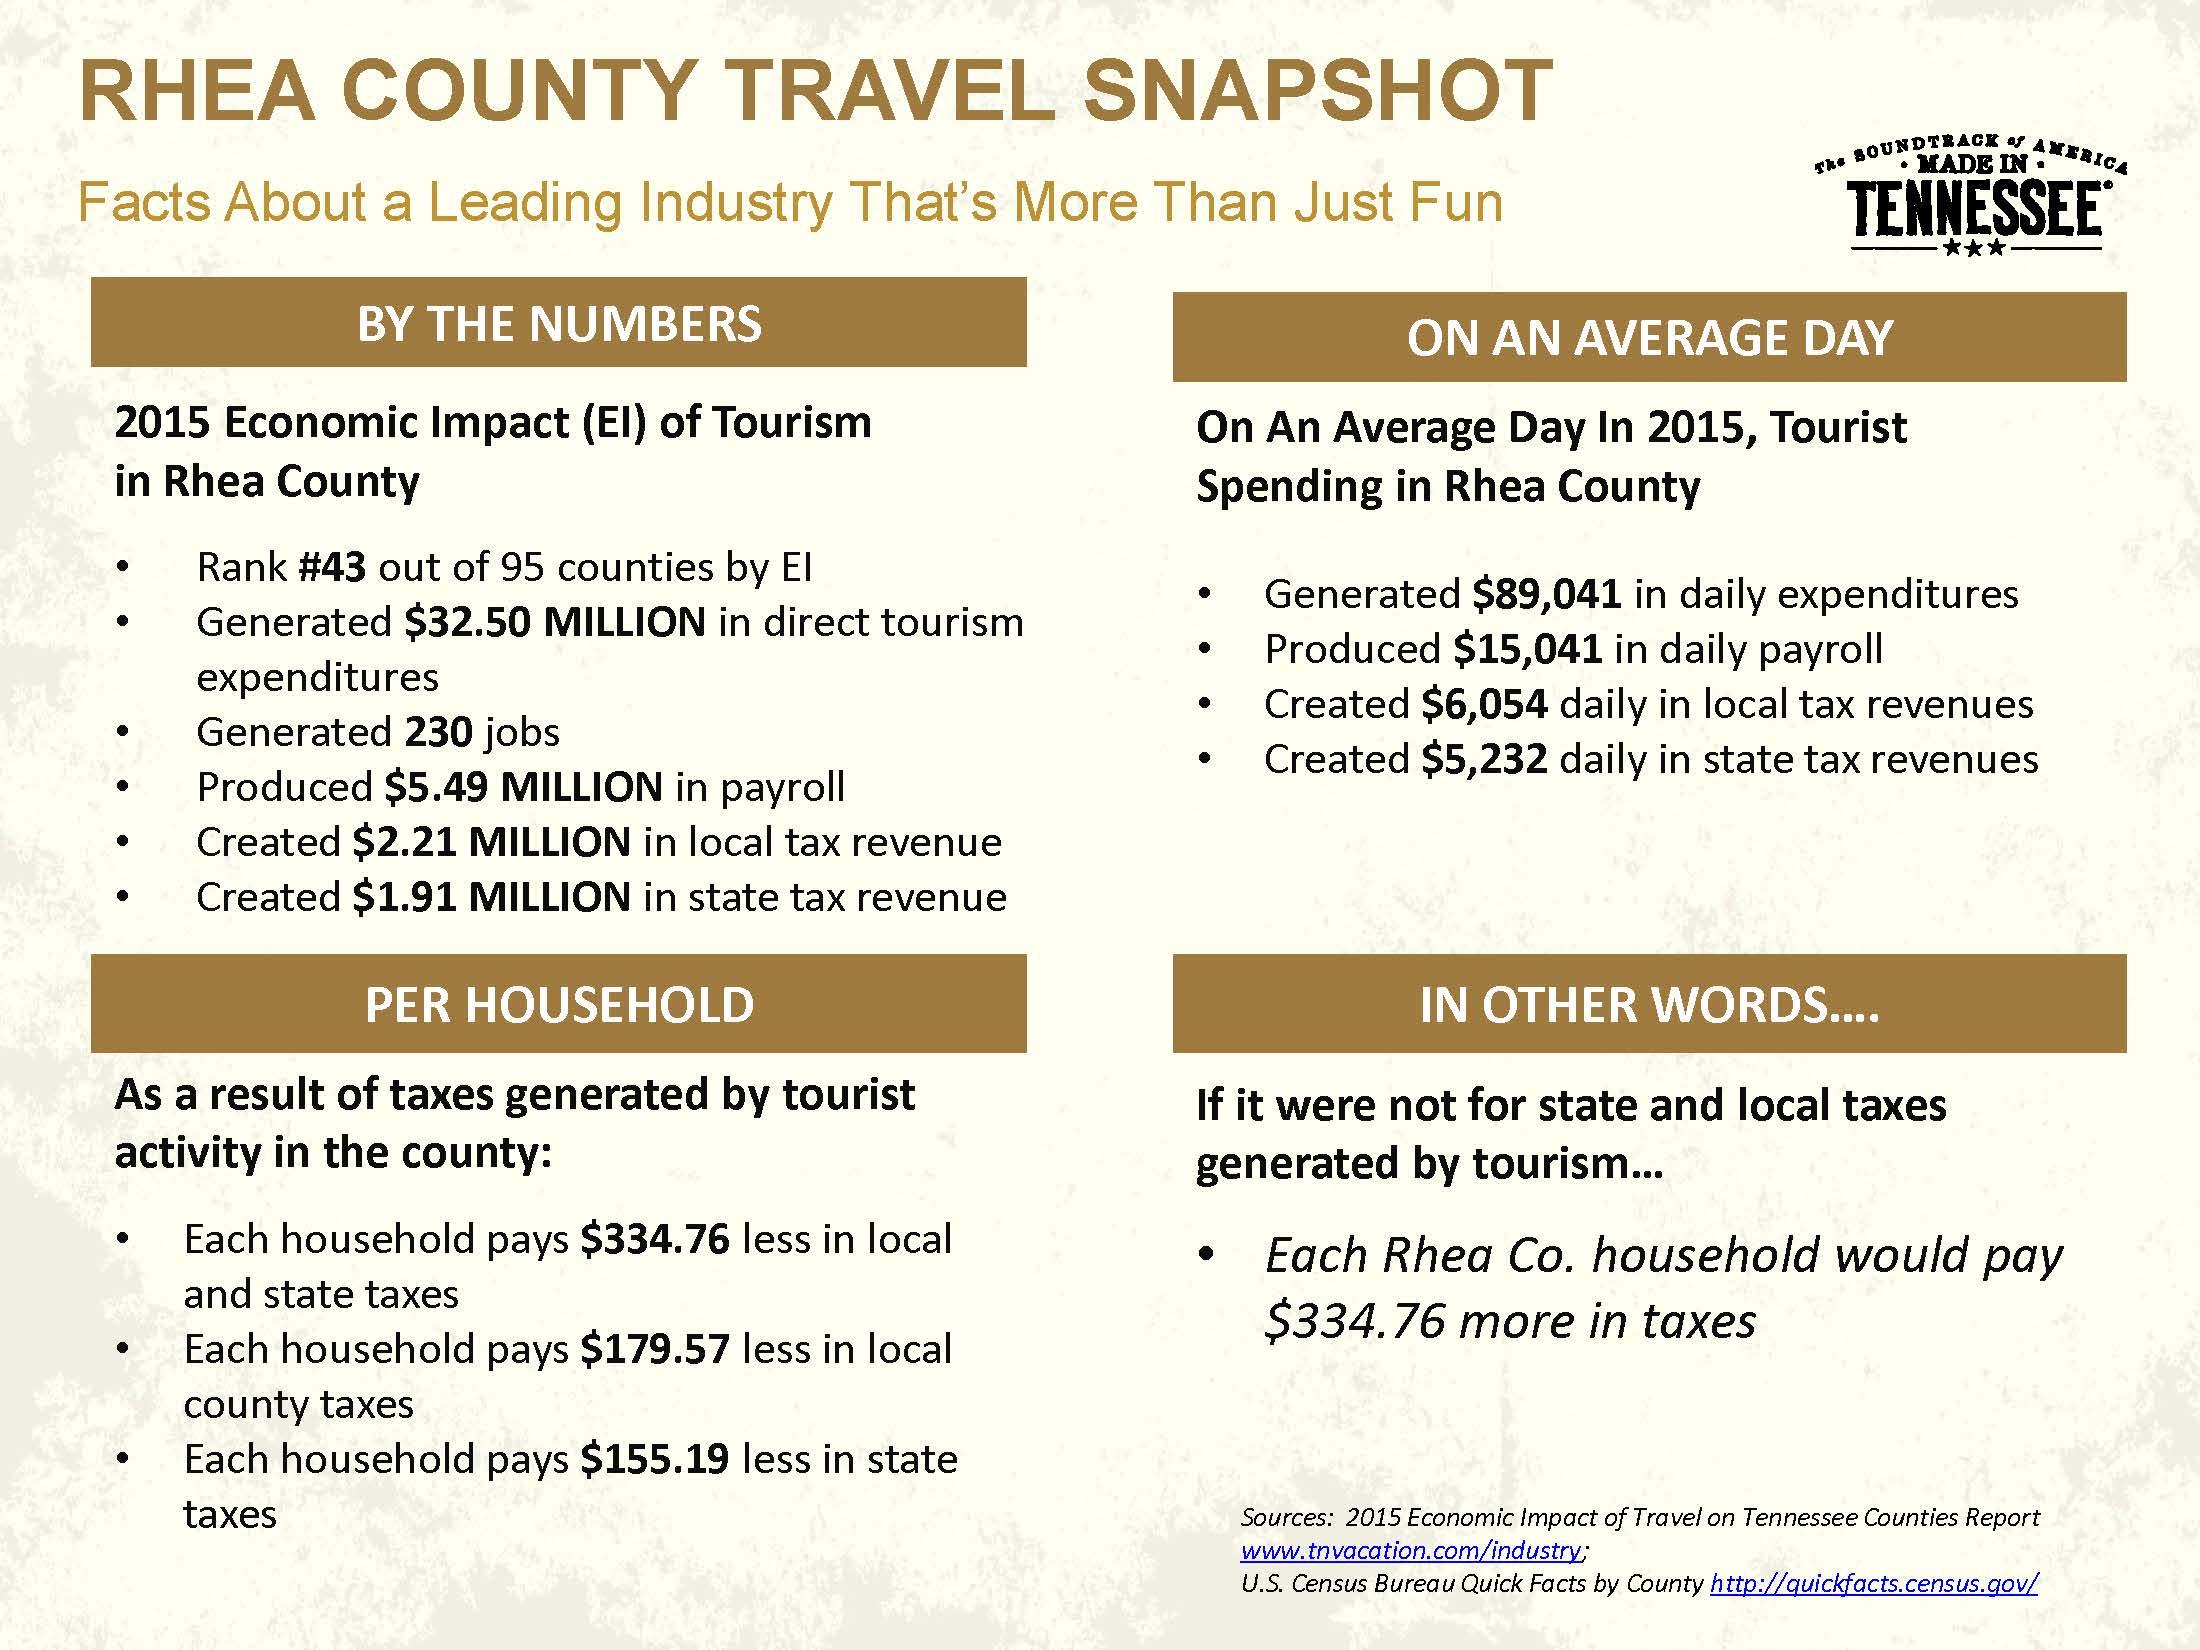 2015 Rhea County Tourism Economic Impact (TN Dept. of Tourism)